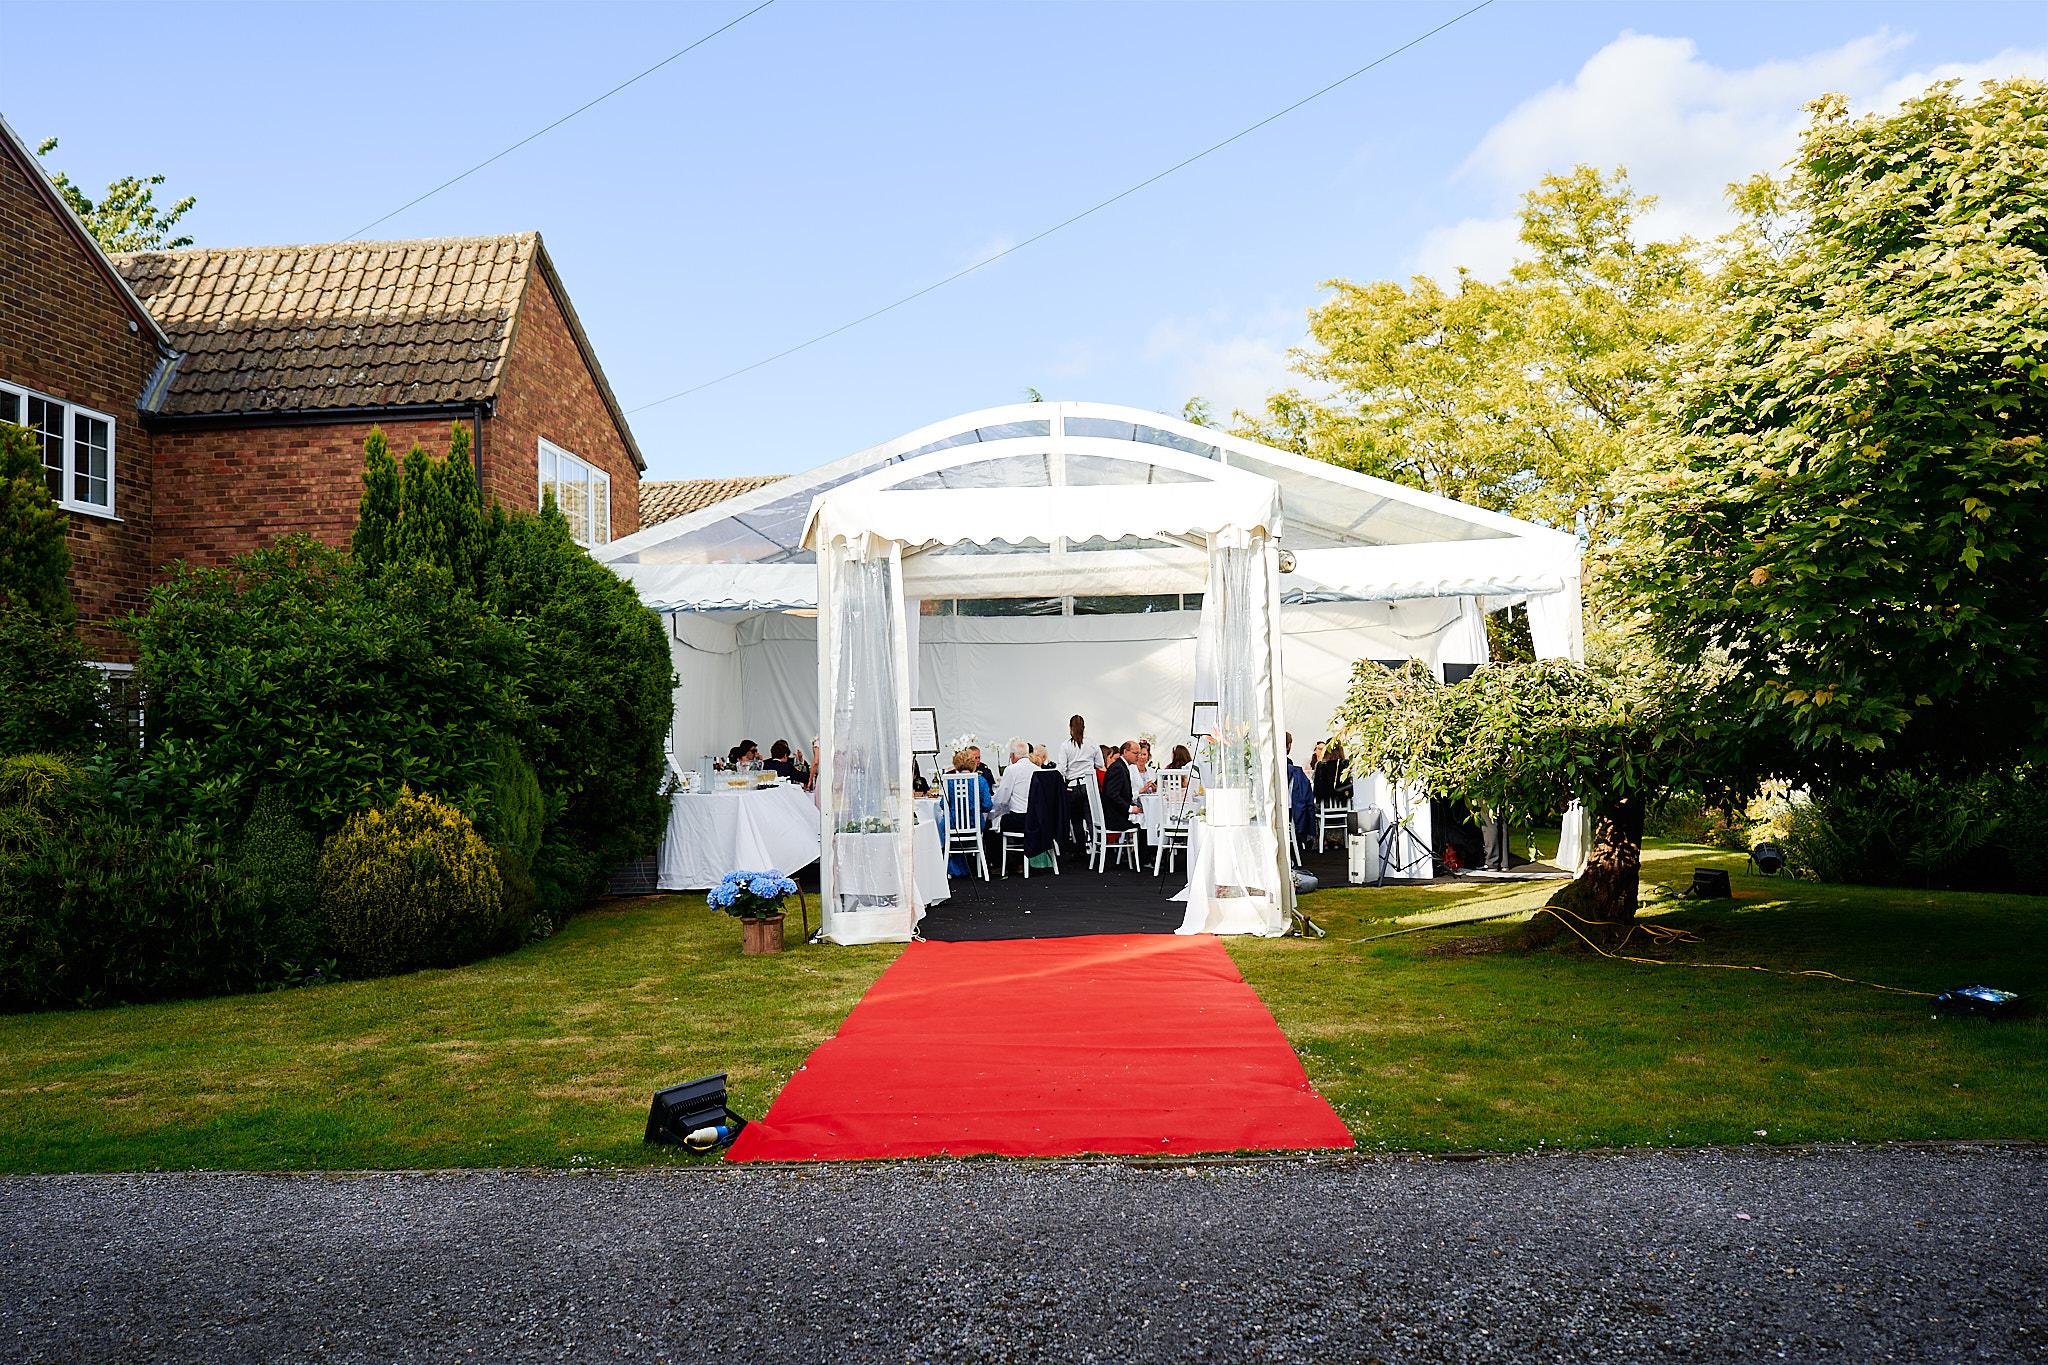 garden marquee for summer wedding